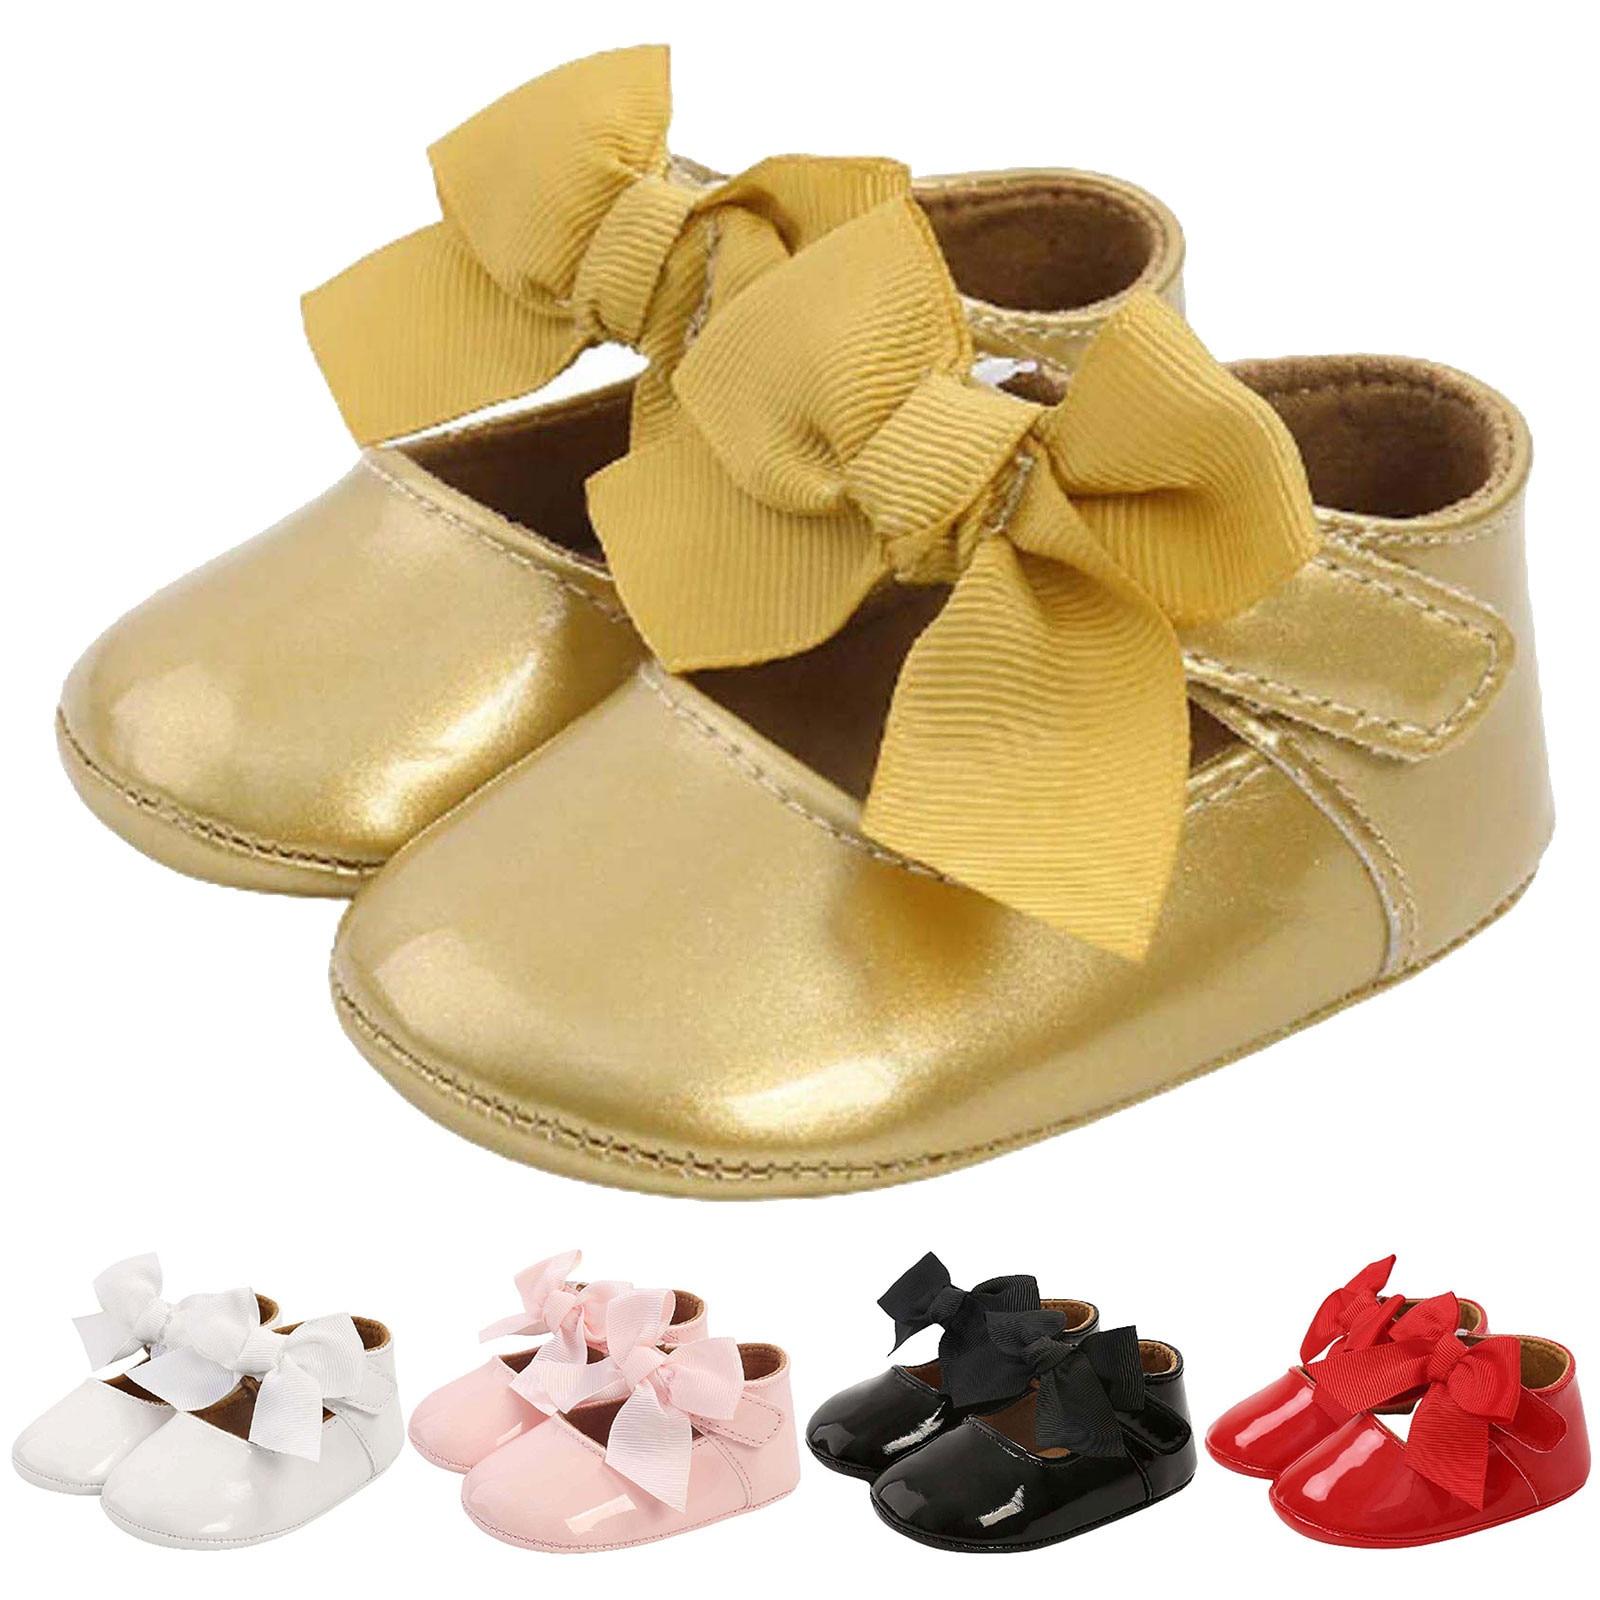 Kids Shoes Girls Shoes Baby Girl Flat Shoelace Bowknot Non-slip Toddler Princess Dress Toddler Chaussure Fille детская обувь